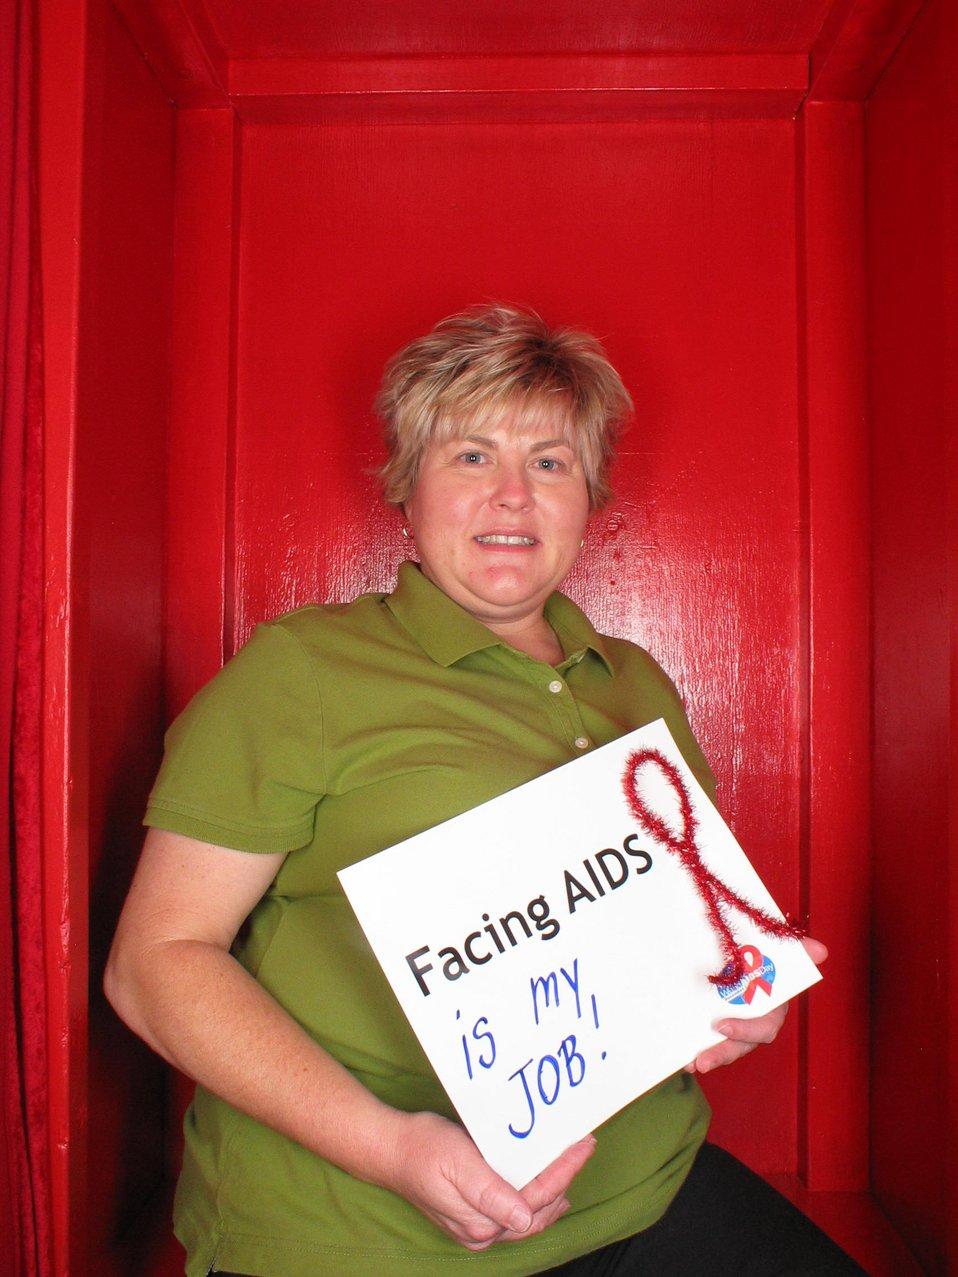 Facing AIDS is my job!